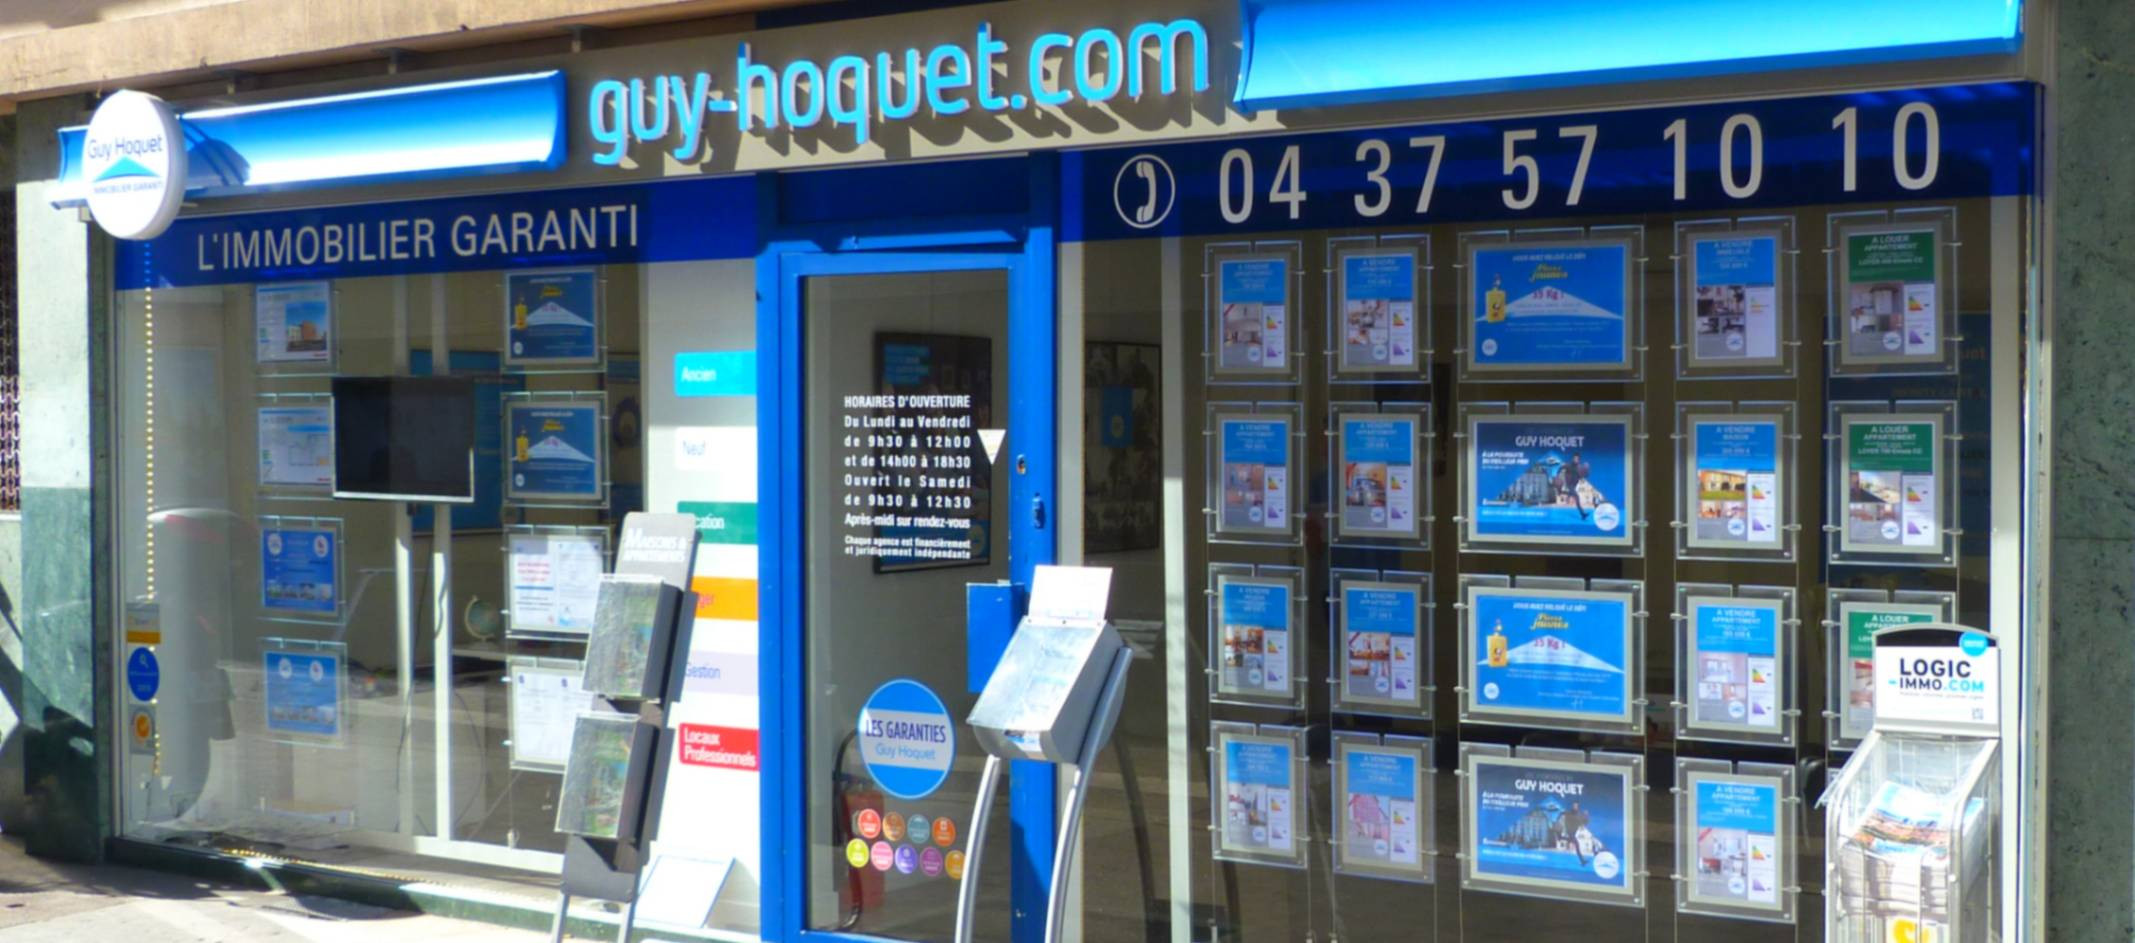 Agence Guy Hoquet VILLEURBANNE GRATTE CIEL